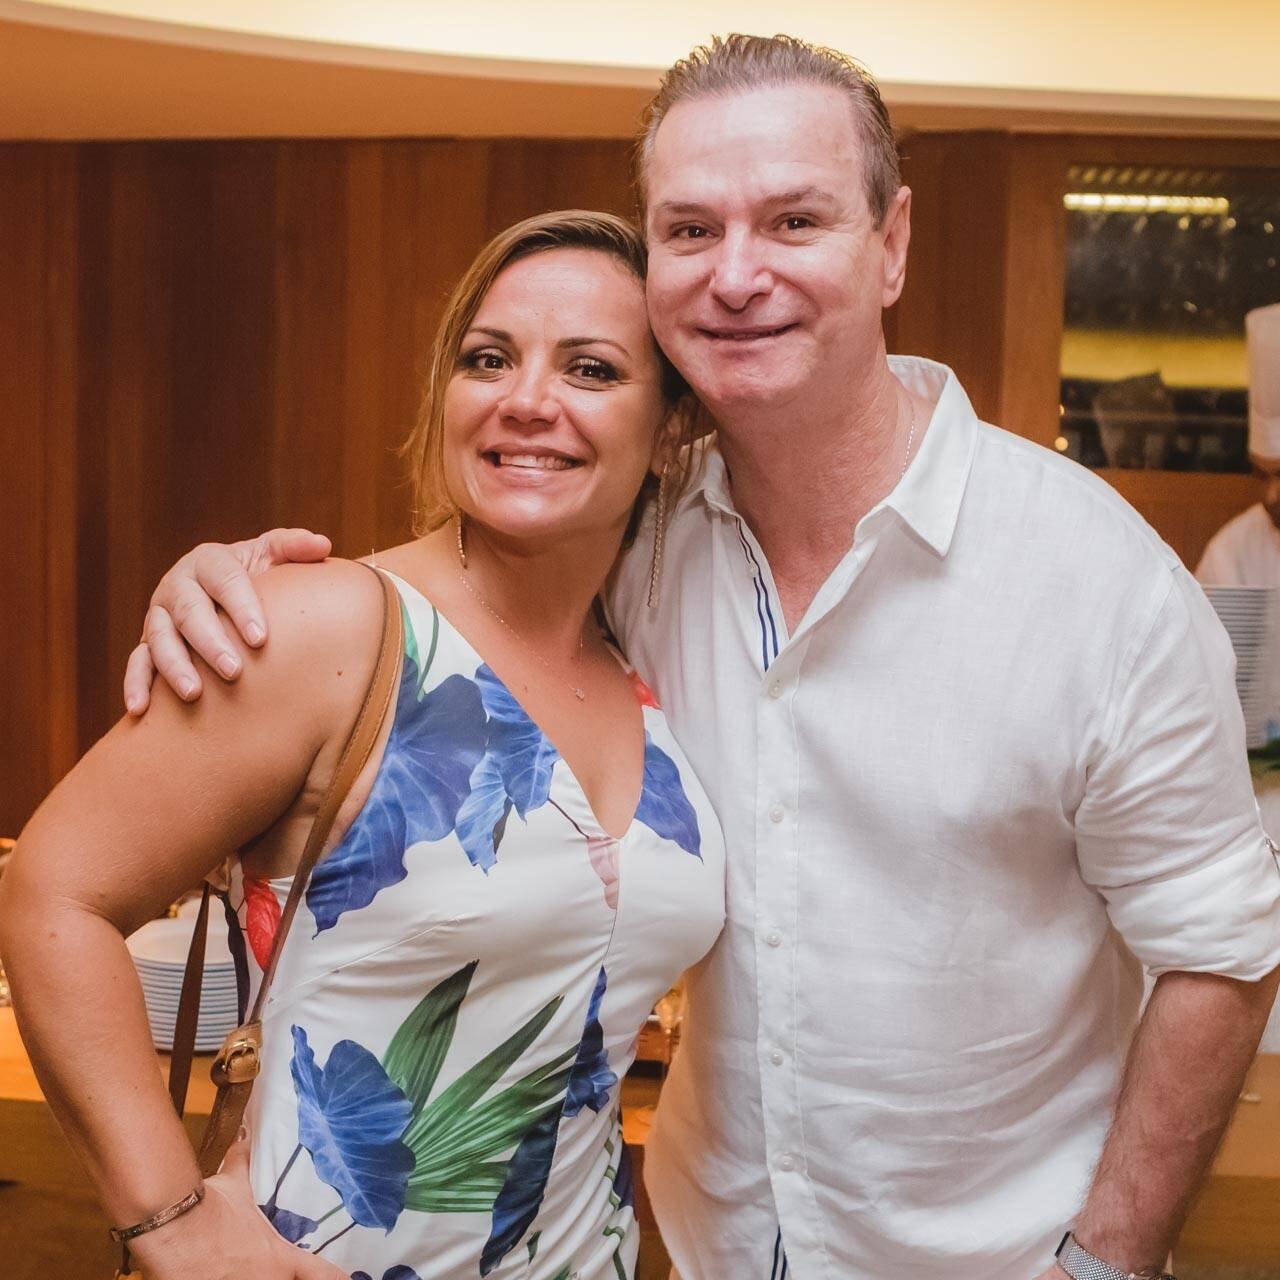 Paula Simonsen e Marcio Alaor Araújo